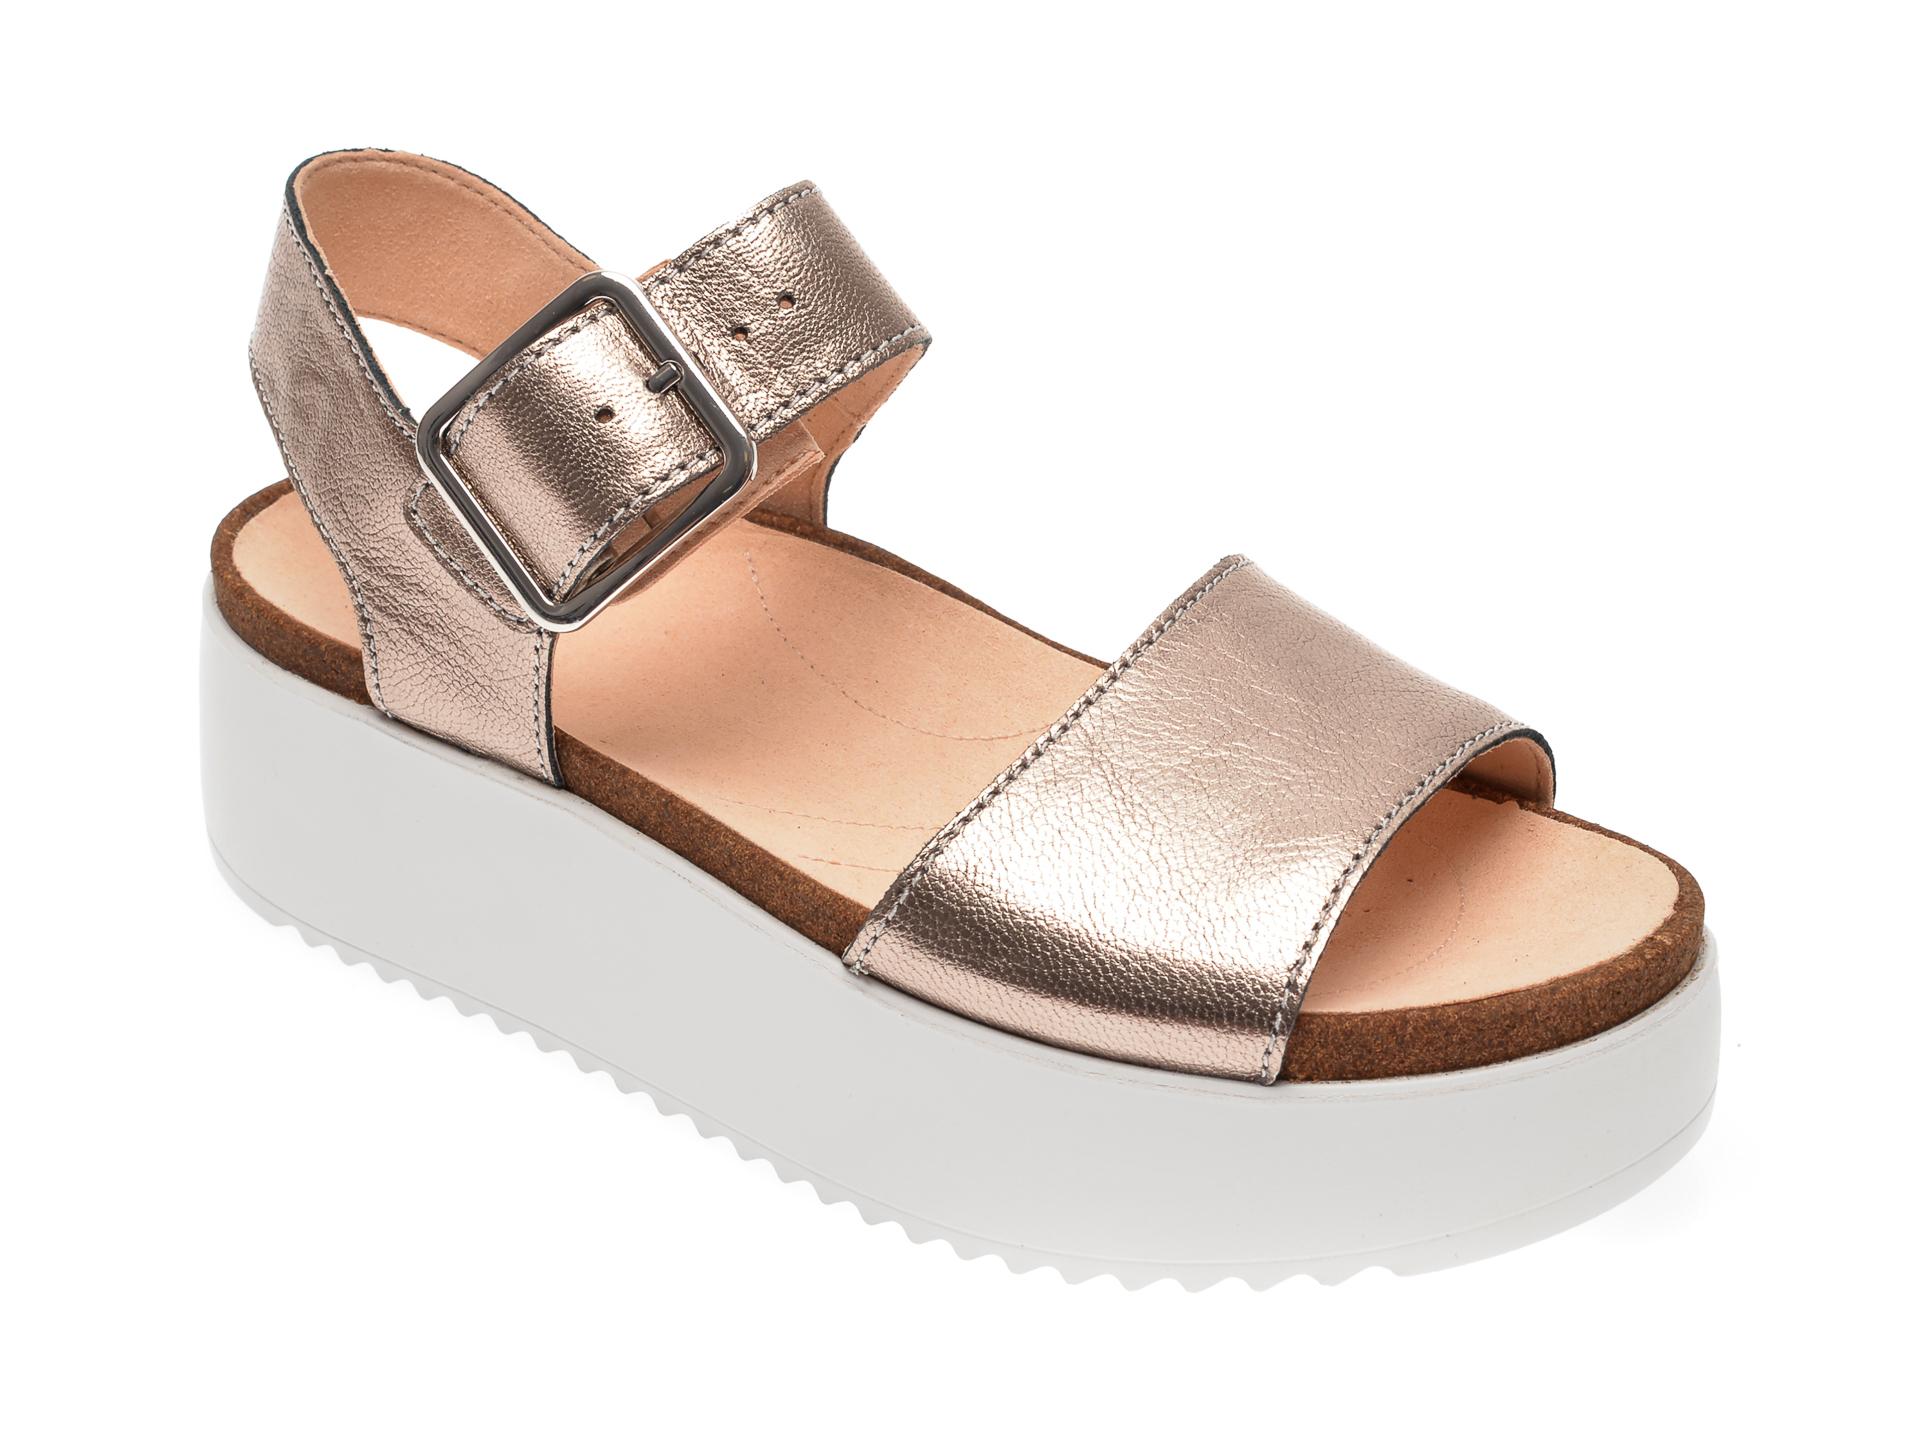 Sandale CLARKS argintii, Tri Alexia, din piele naturala